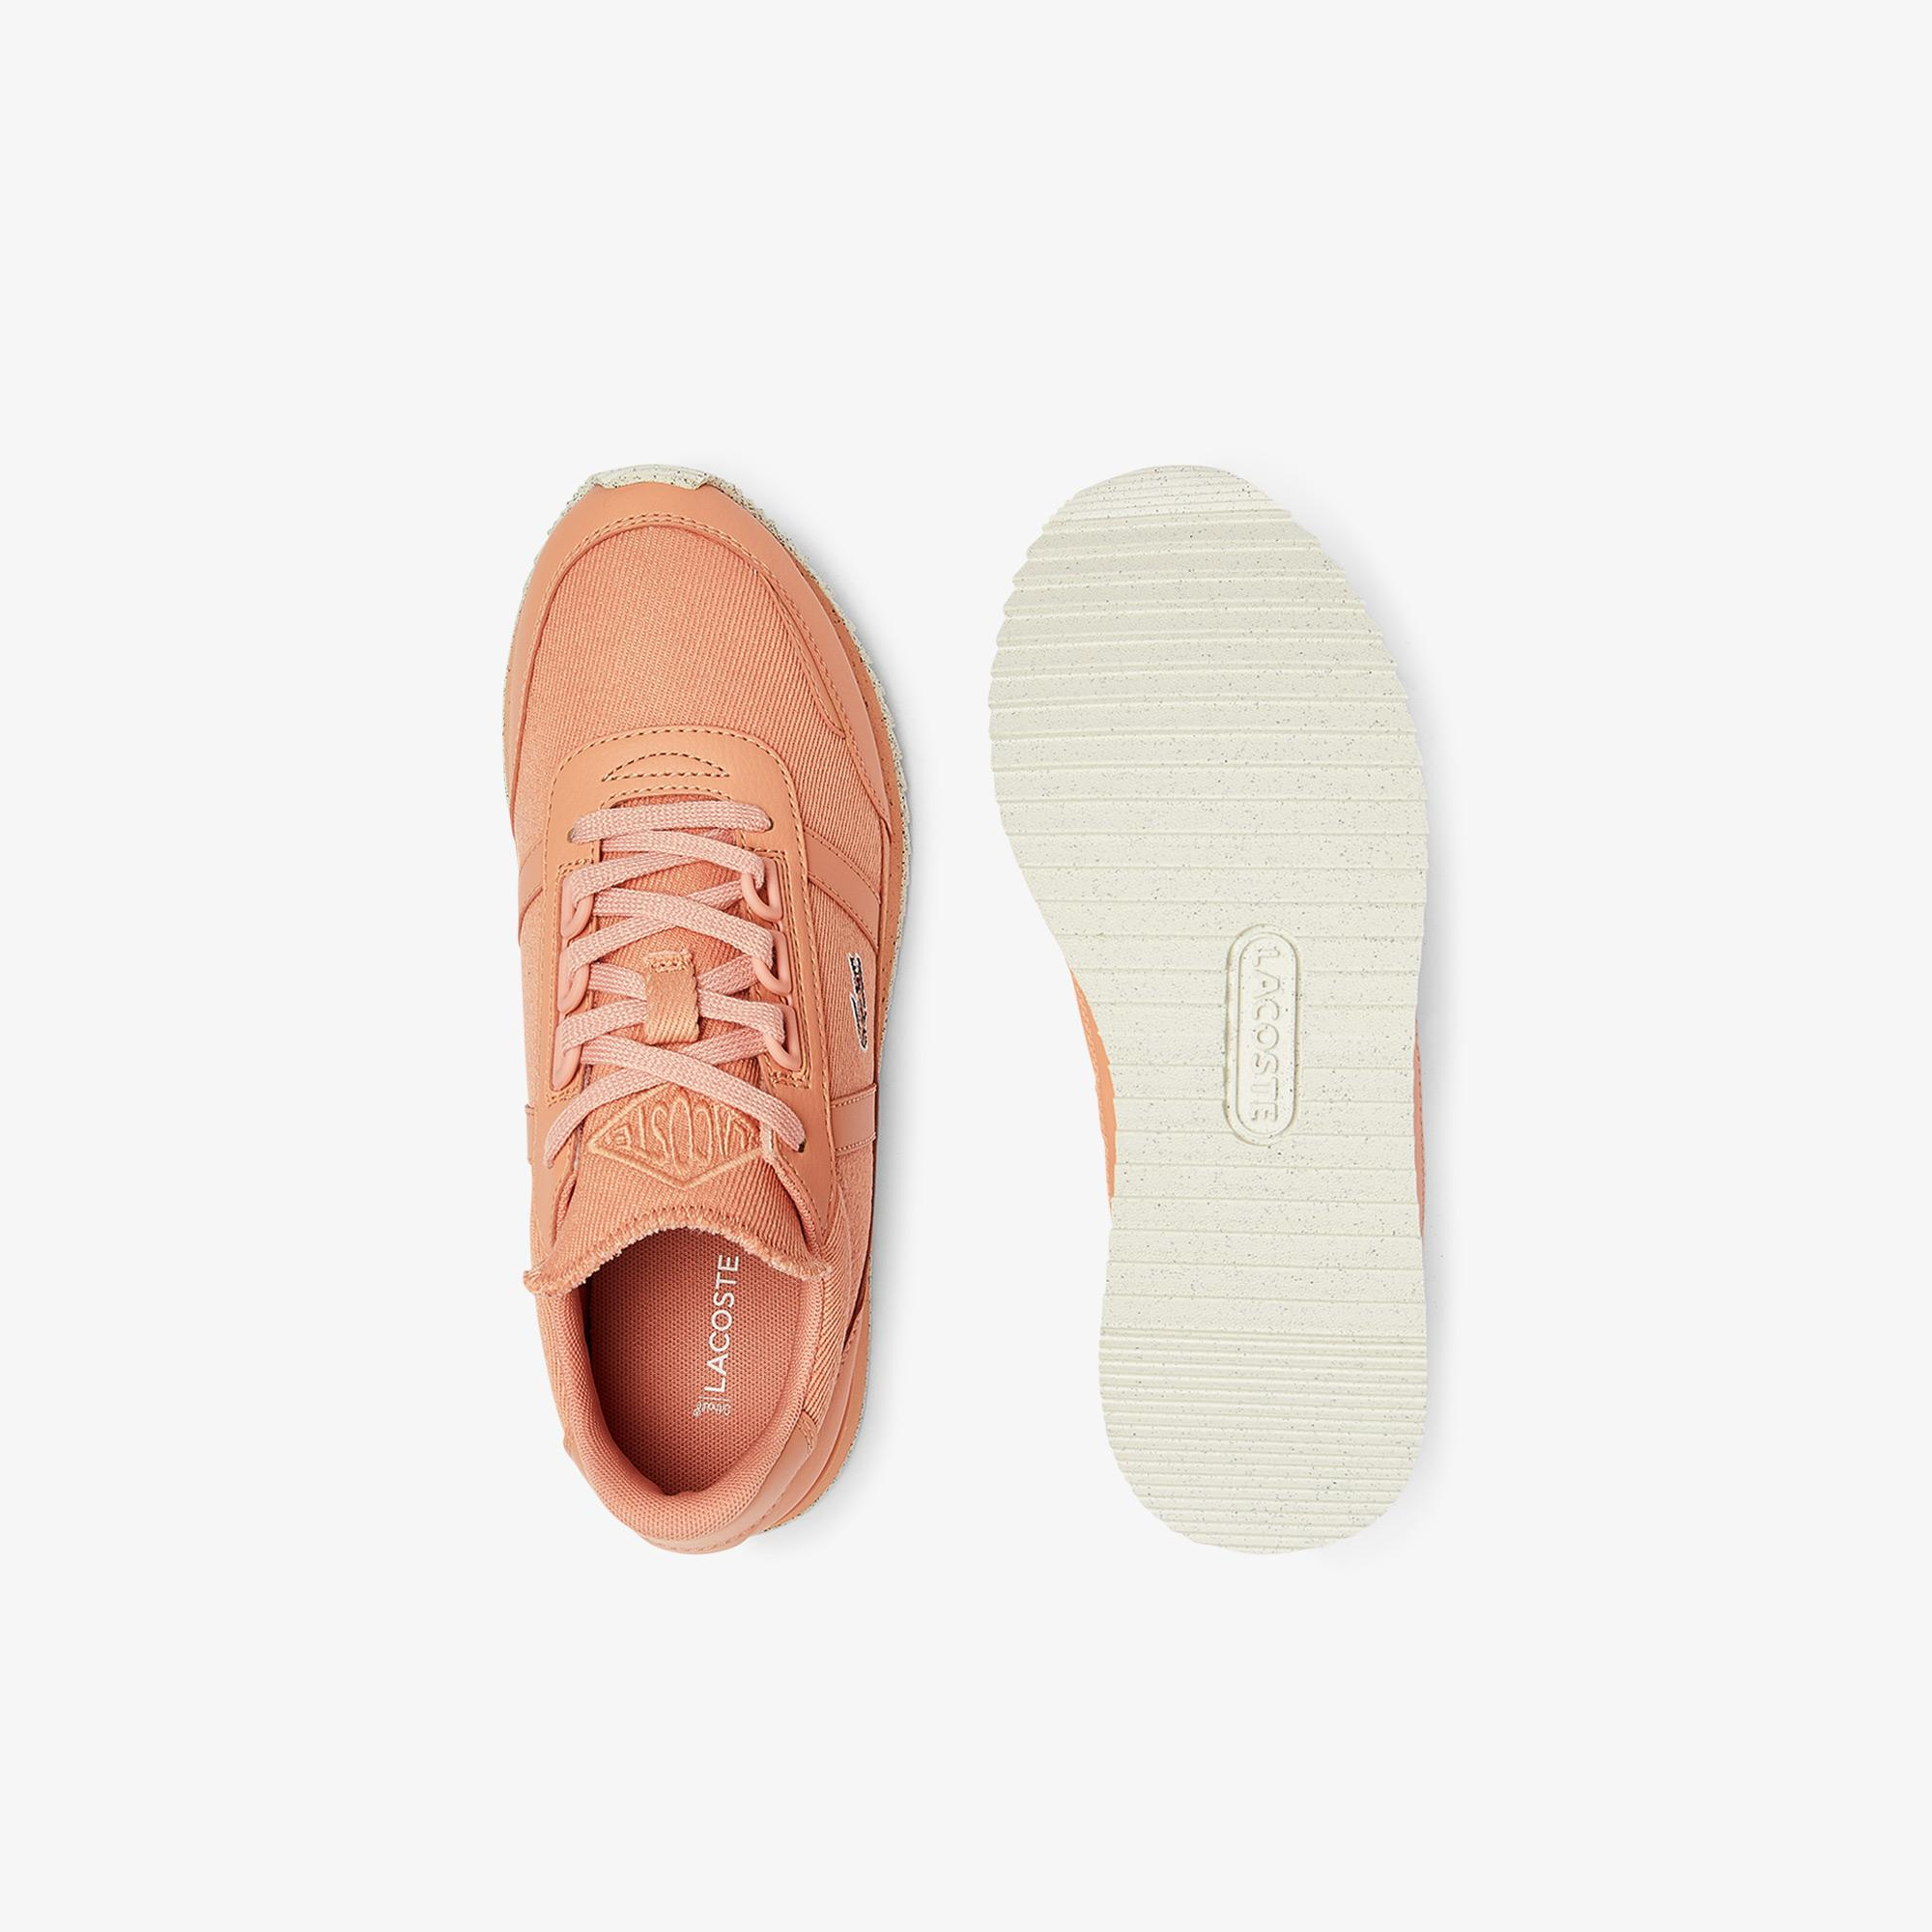 Lacoste Damskie buty Partner Retro 0921 1 Sfa